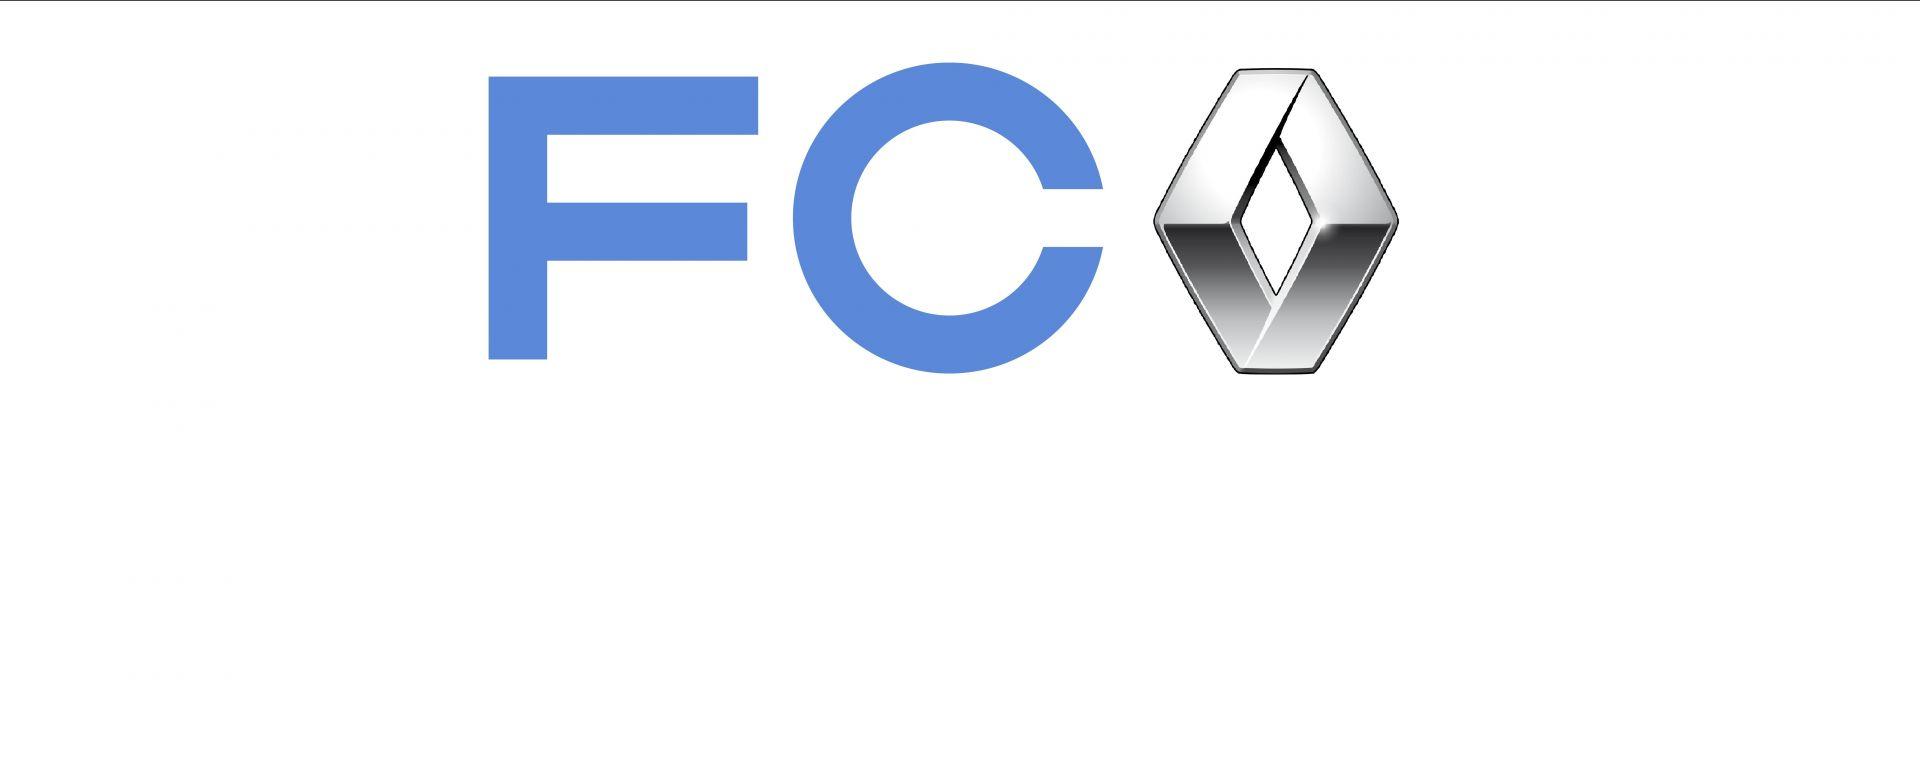 FCA-Renault: quali saranno i termini della partnership?